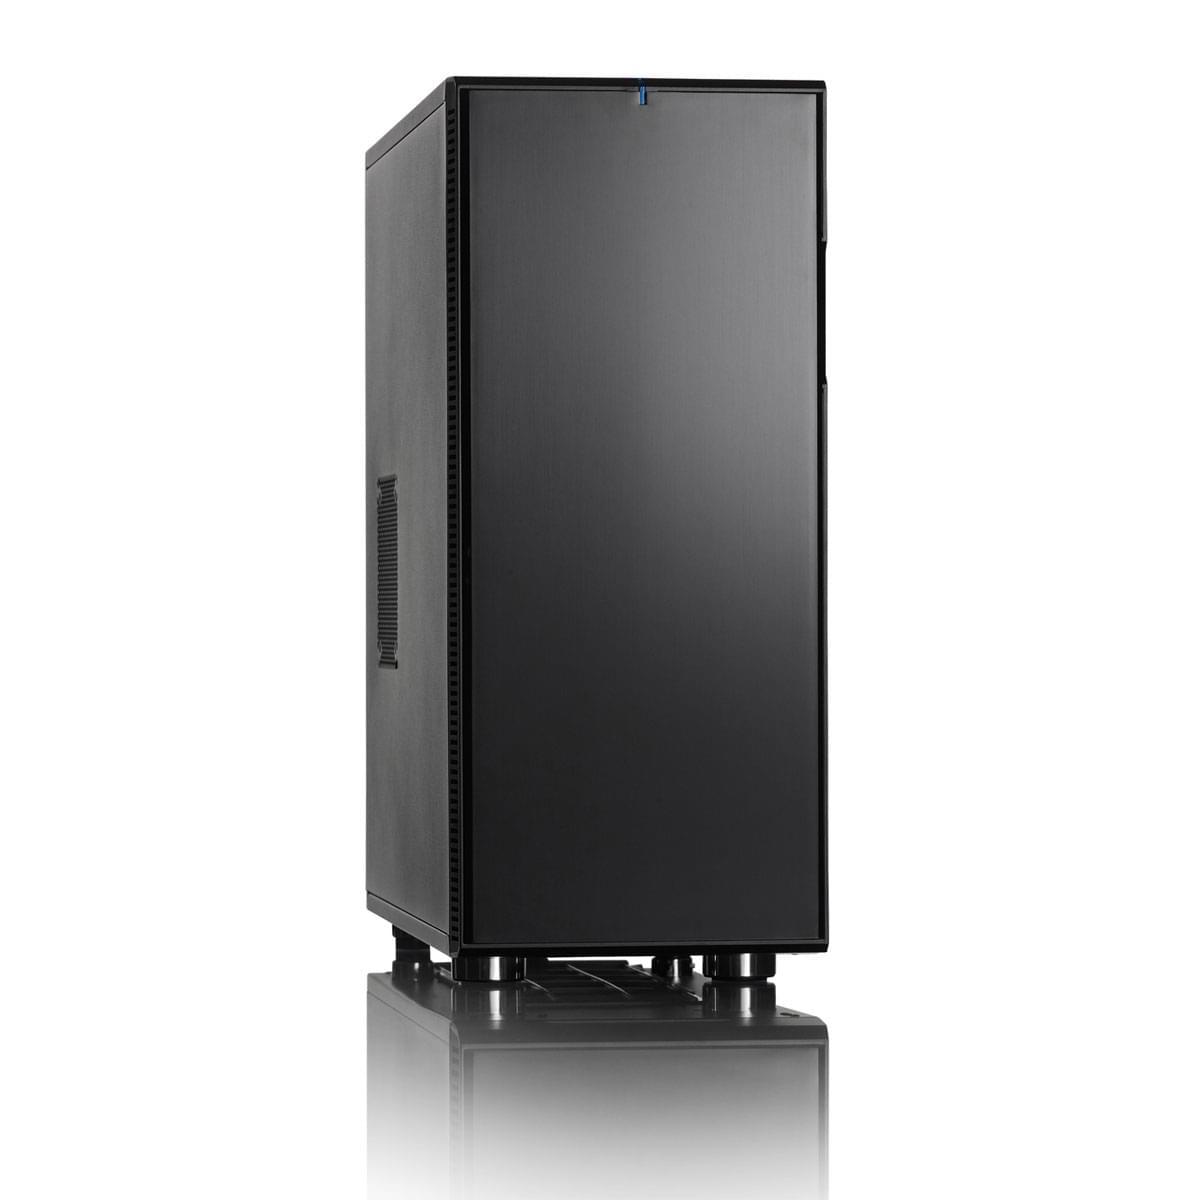 Fractal Design Define XL R2 Black Pearl (FD-CA-DEF-XL-R2-BL) - Achat / Vente Boîtier PC sur Cybertek.fr - 0